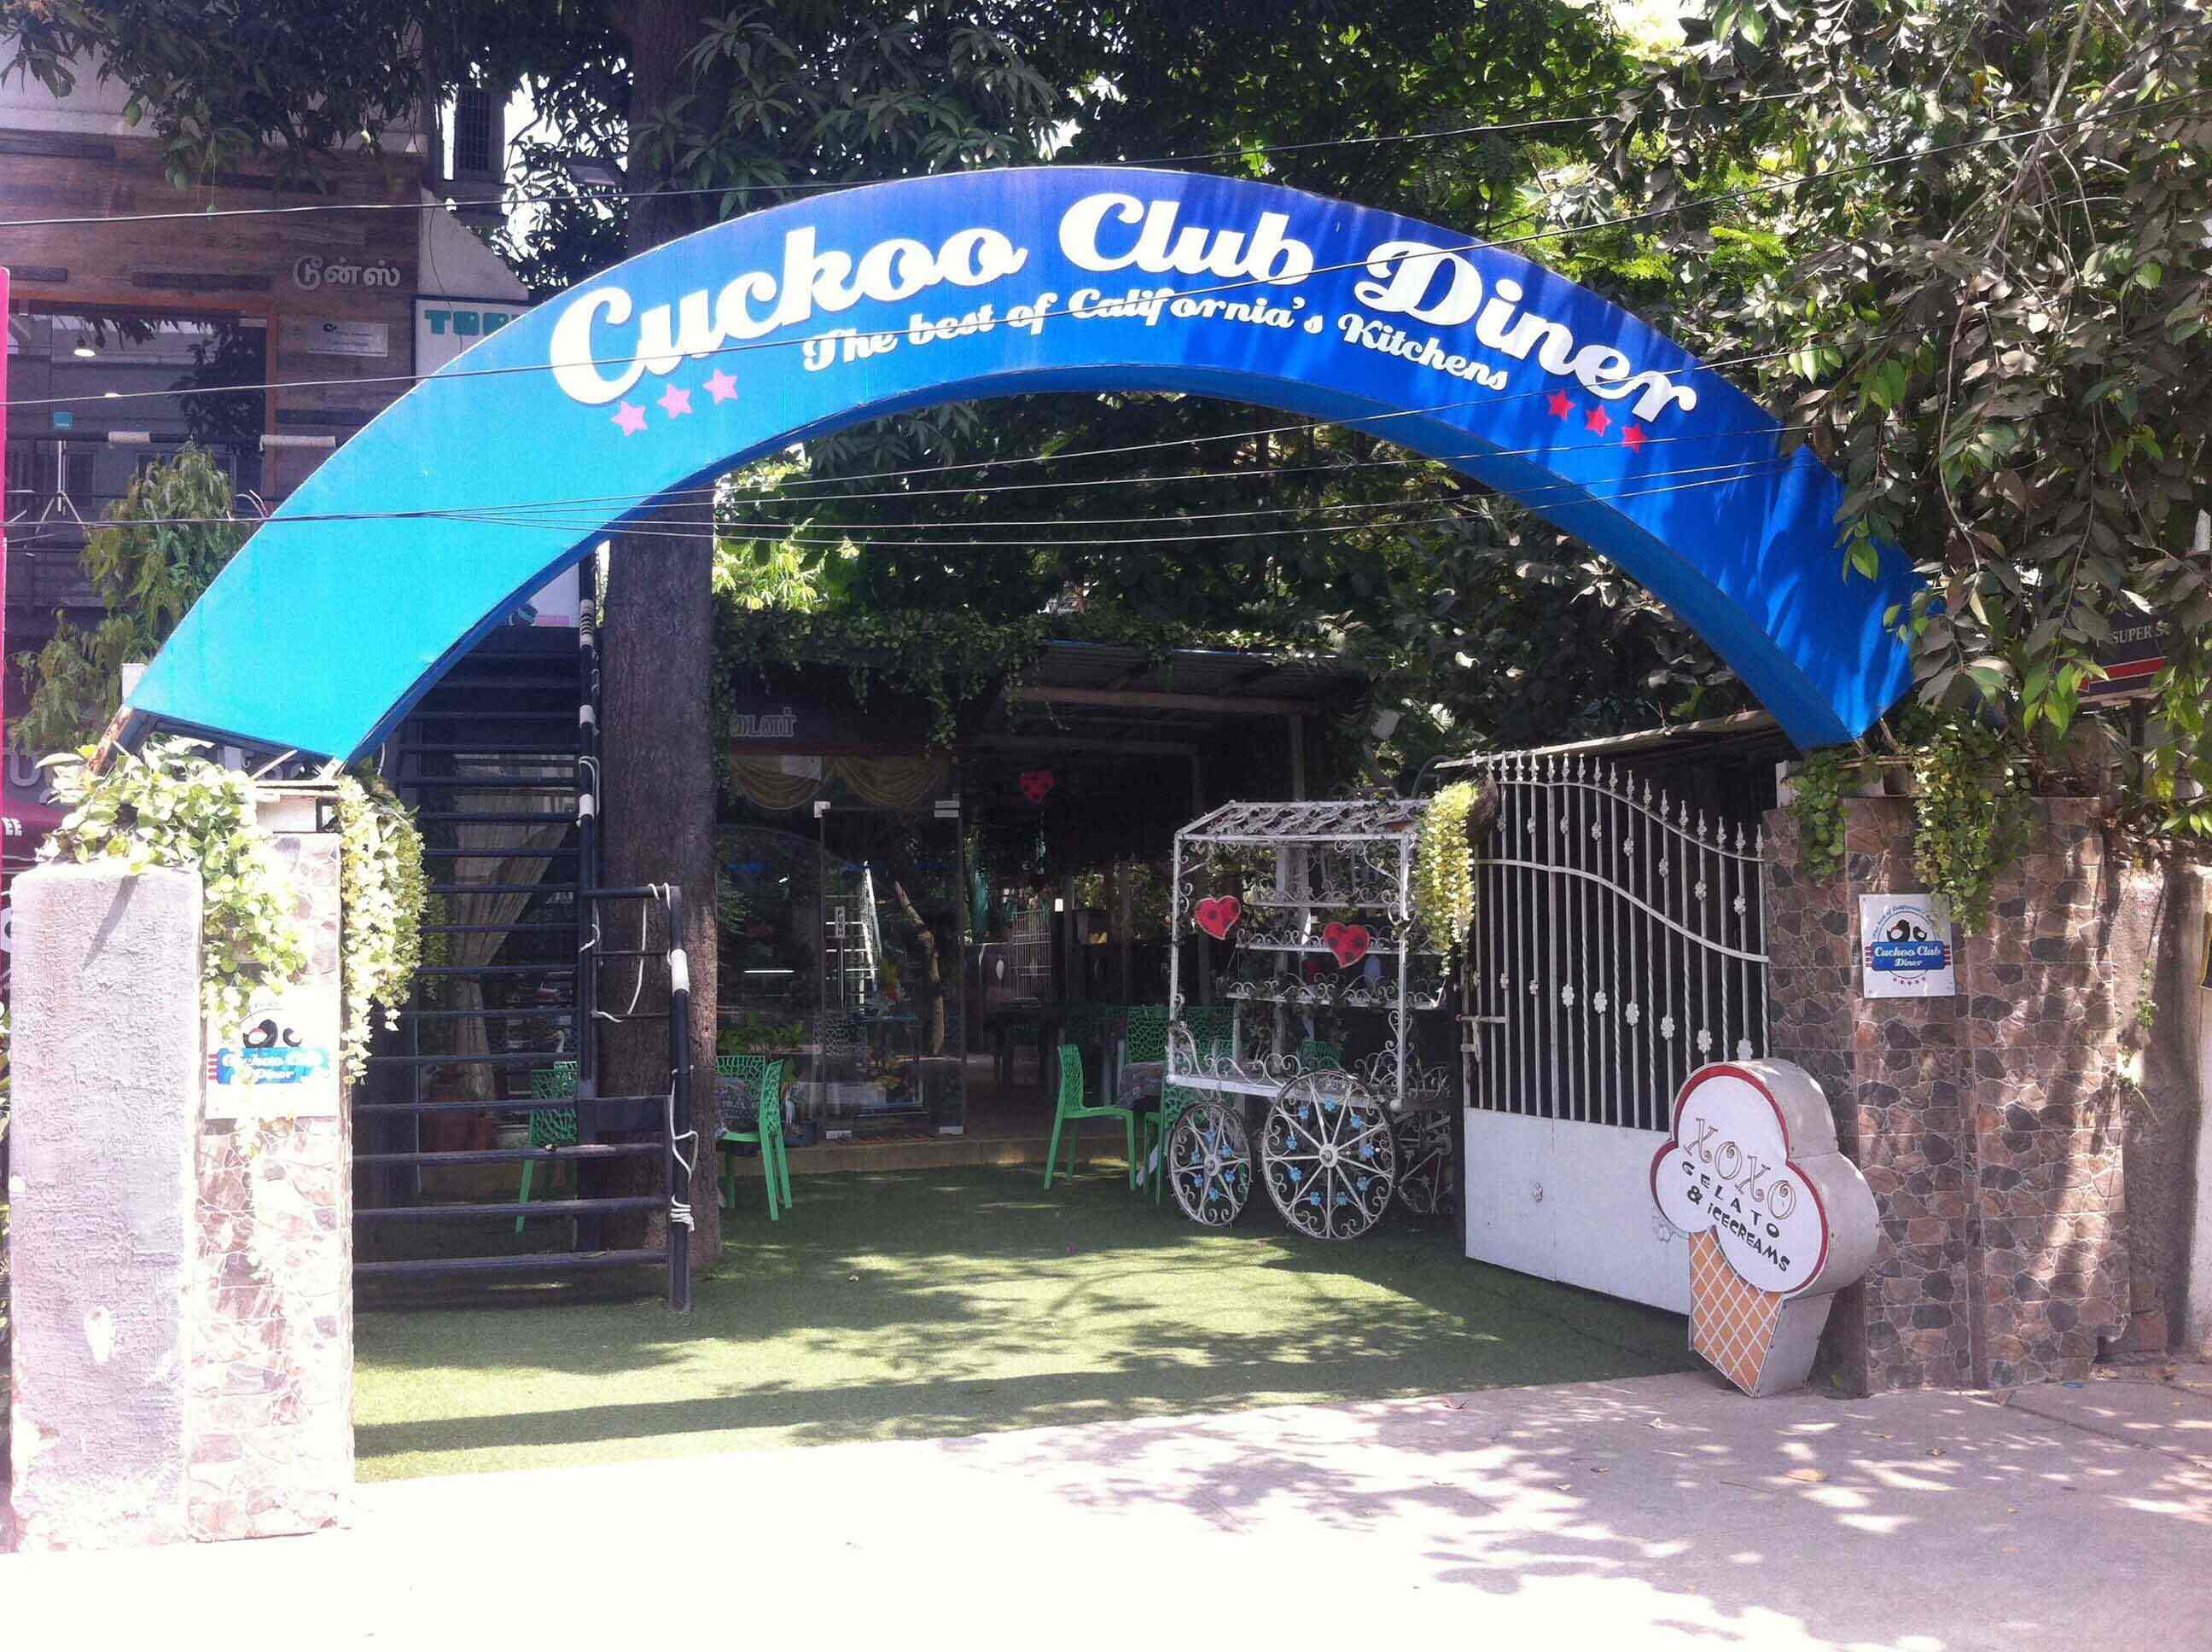 Cuckoo Club Diner - Chetpet - Chennai Image